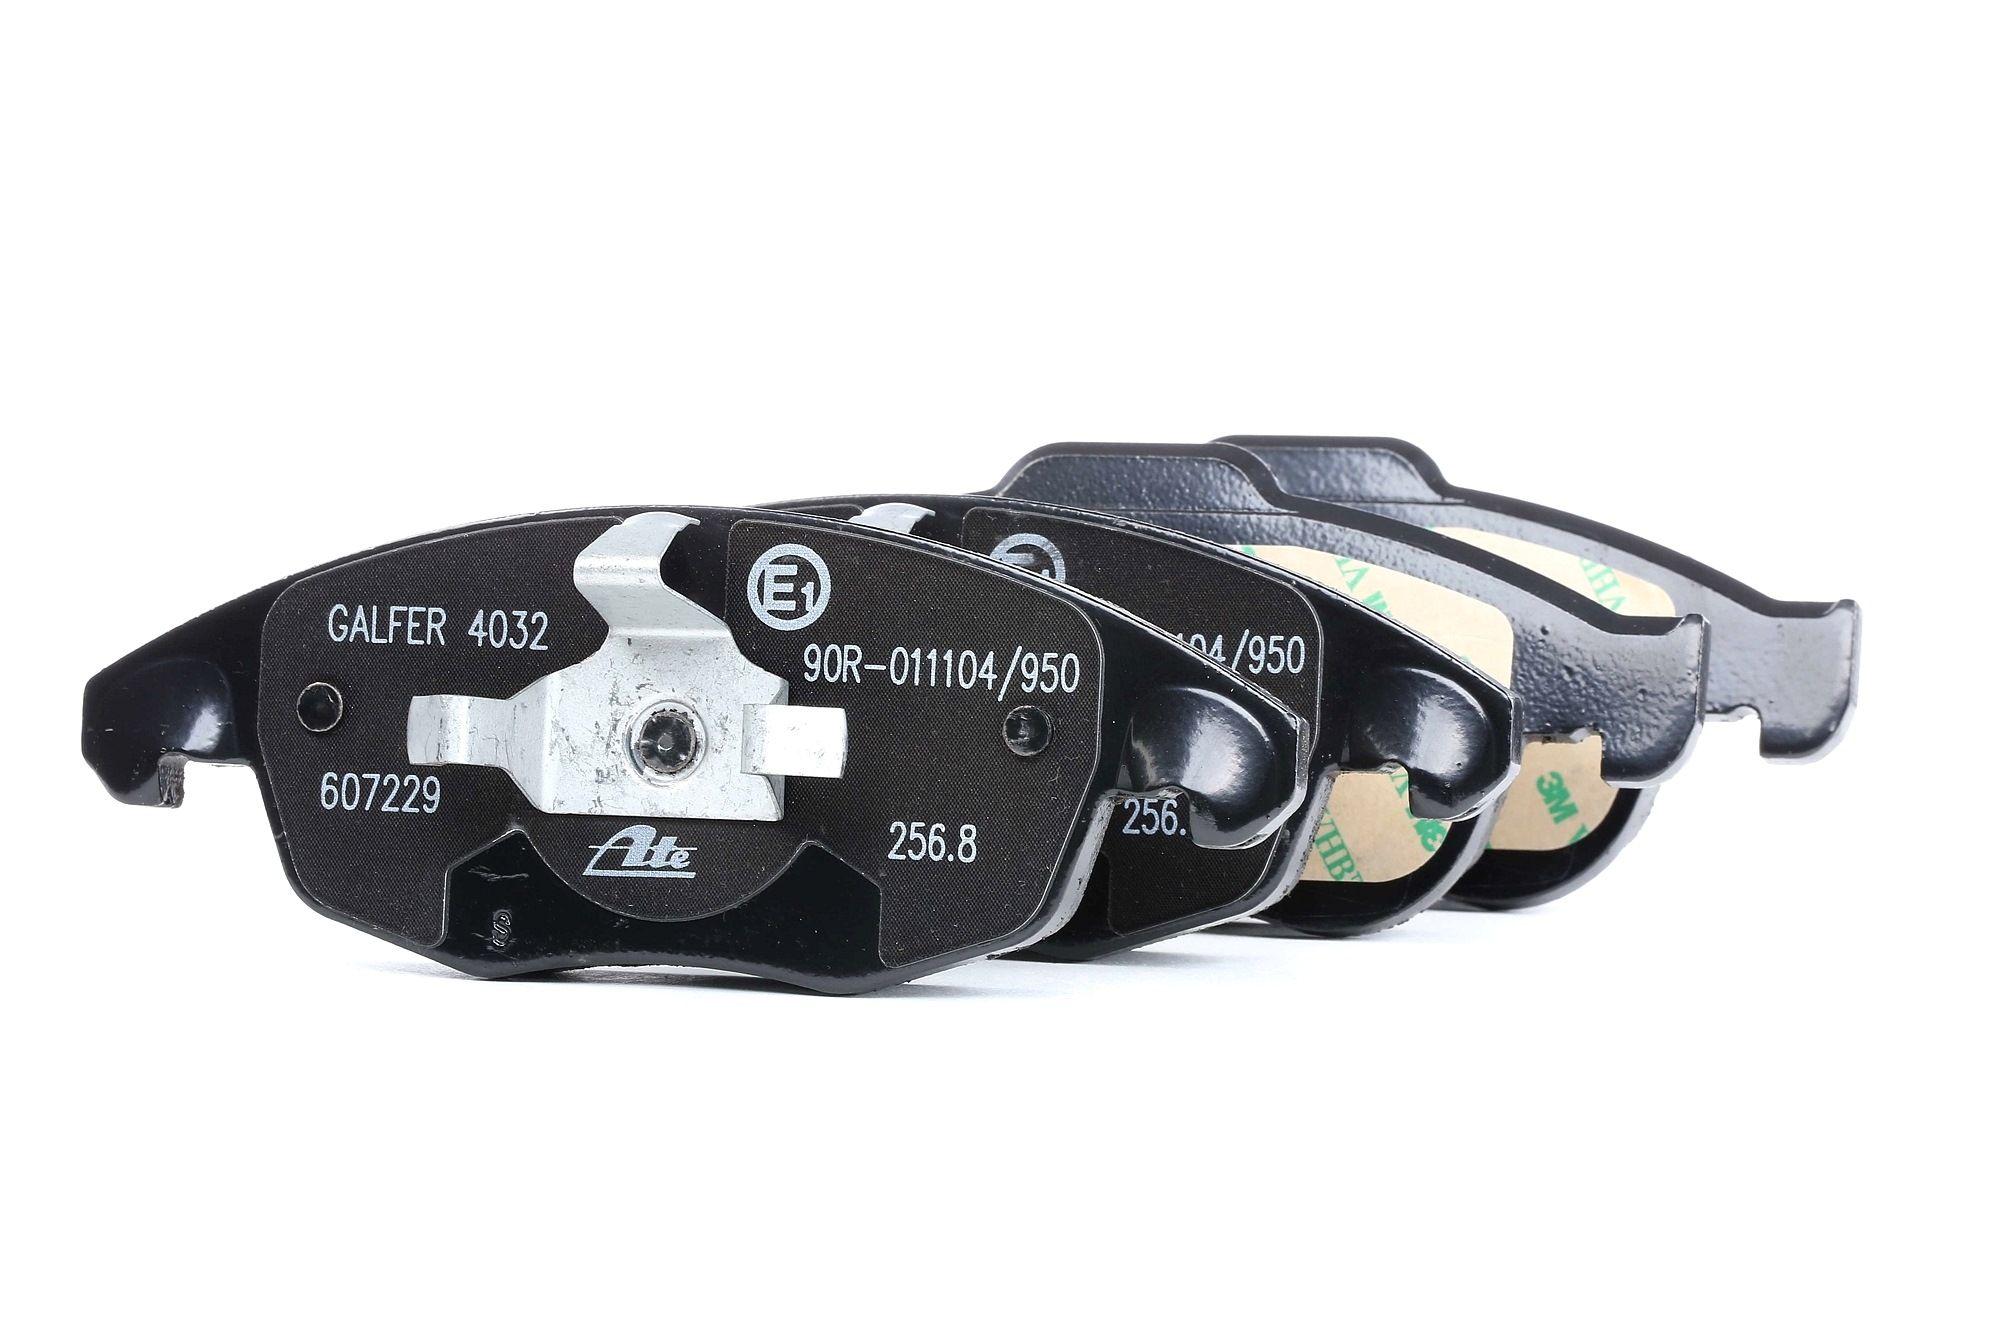 ATE: Original Bremsklötze 13.0460-7229.2 (Höhe 1: 64,7mm, Höhe 2: 58,3mm, Breite 1: 155,1mm, Breite 2: 155,1mm, Dicke/Stärke 1: 18,5mm, Dicke/Stärke 2: 18,5mm)